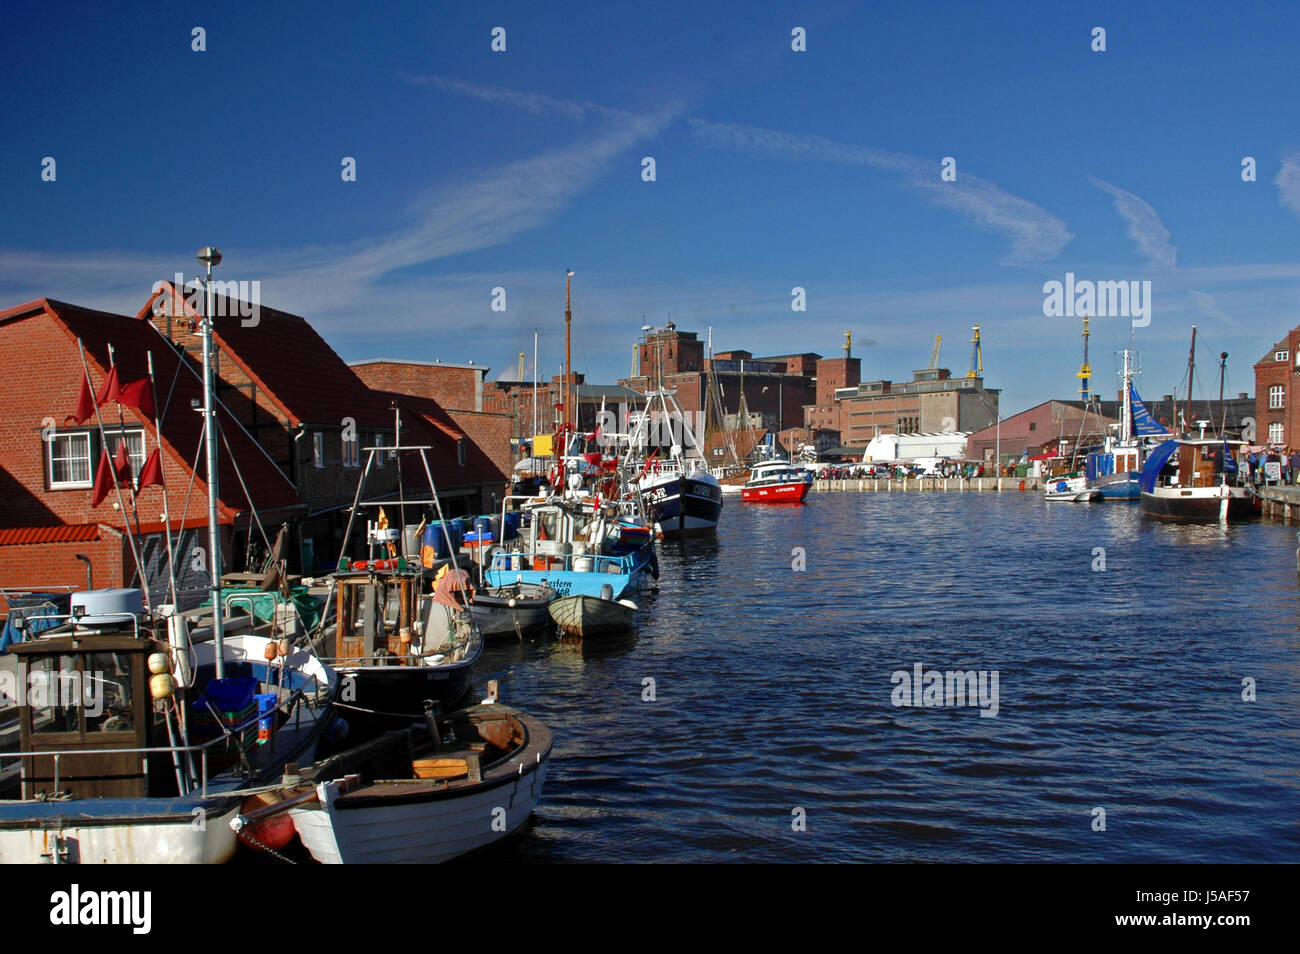 blue houses city town waters ships sailing boat sailboat rowing boat boat - Stock Image